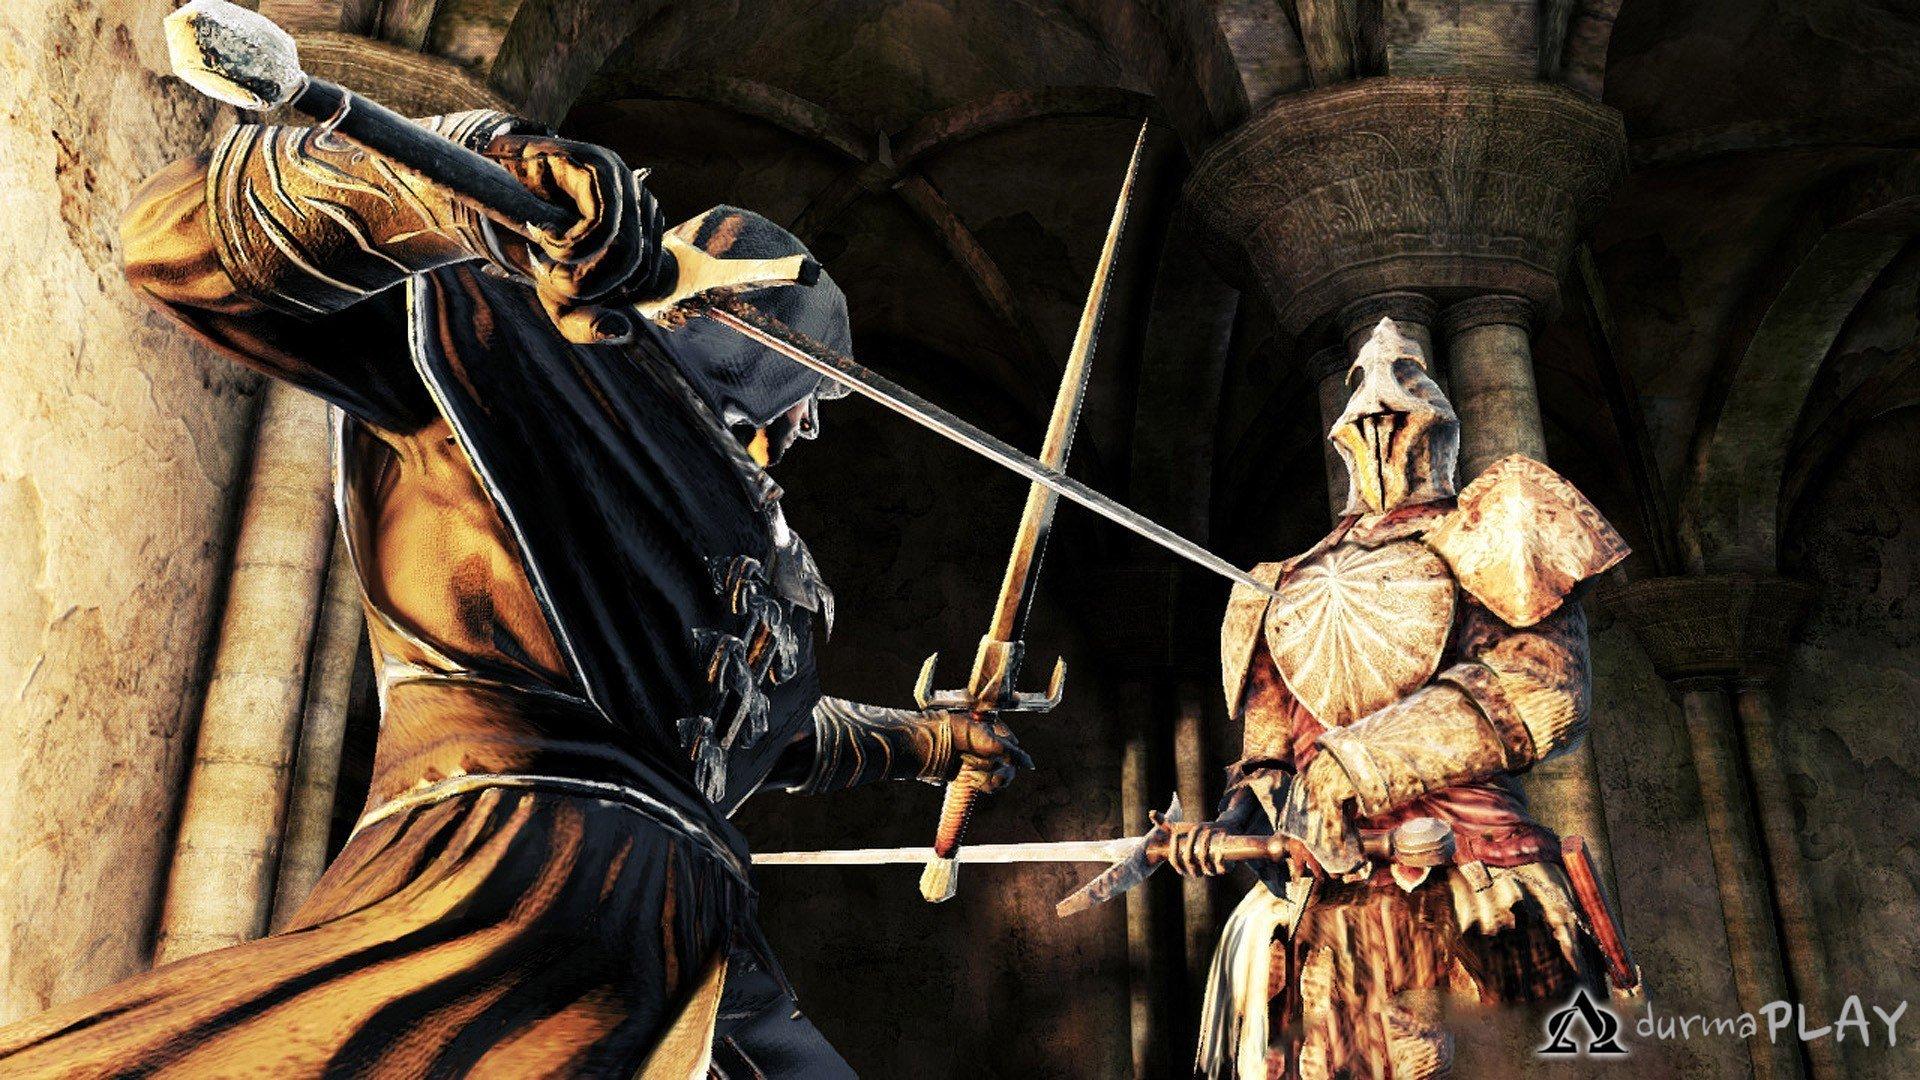 Dark Souls 2 PS3 Dark Souls 2   Playstation 3 Satn Al 1920x1080